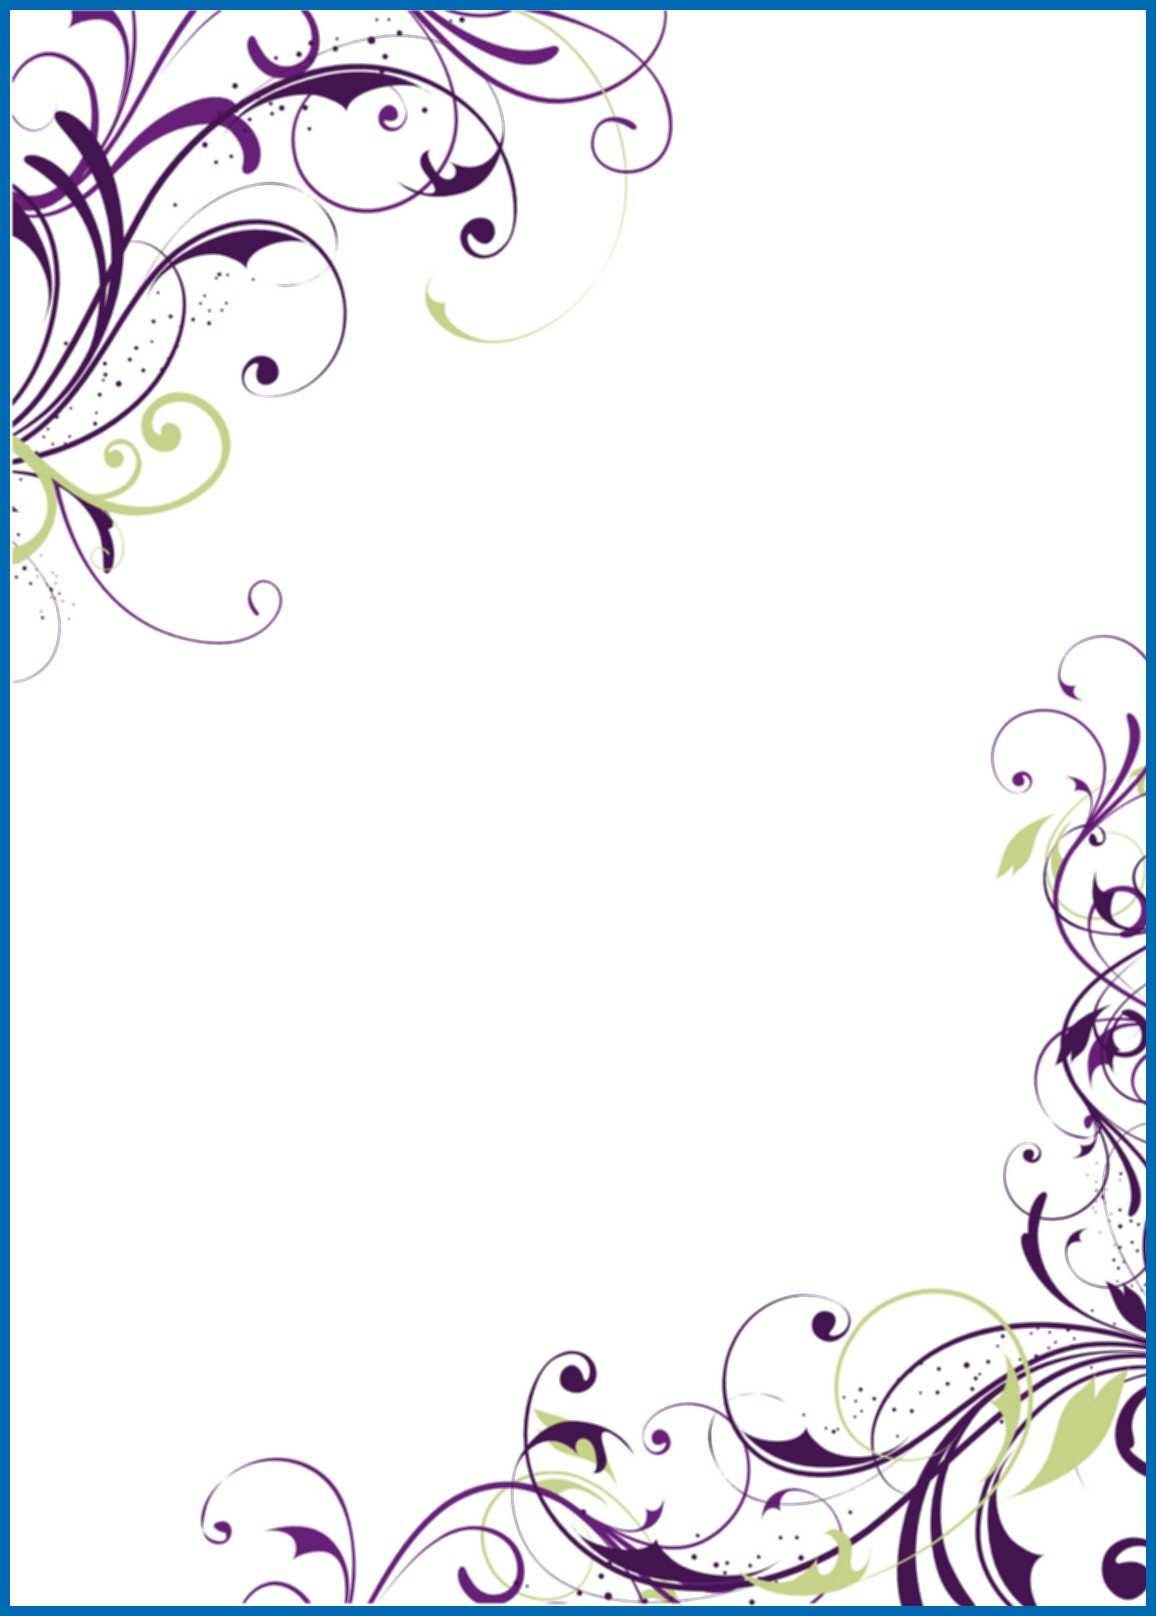 66 Standard Blank Invitation Templates For Microsoft Word Formating for Blank Invitation Templates For Microsoft Word